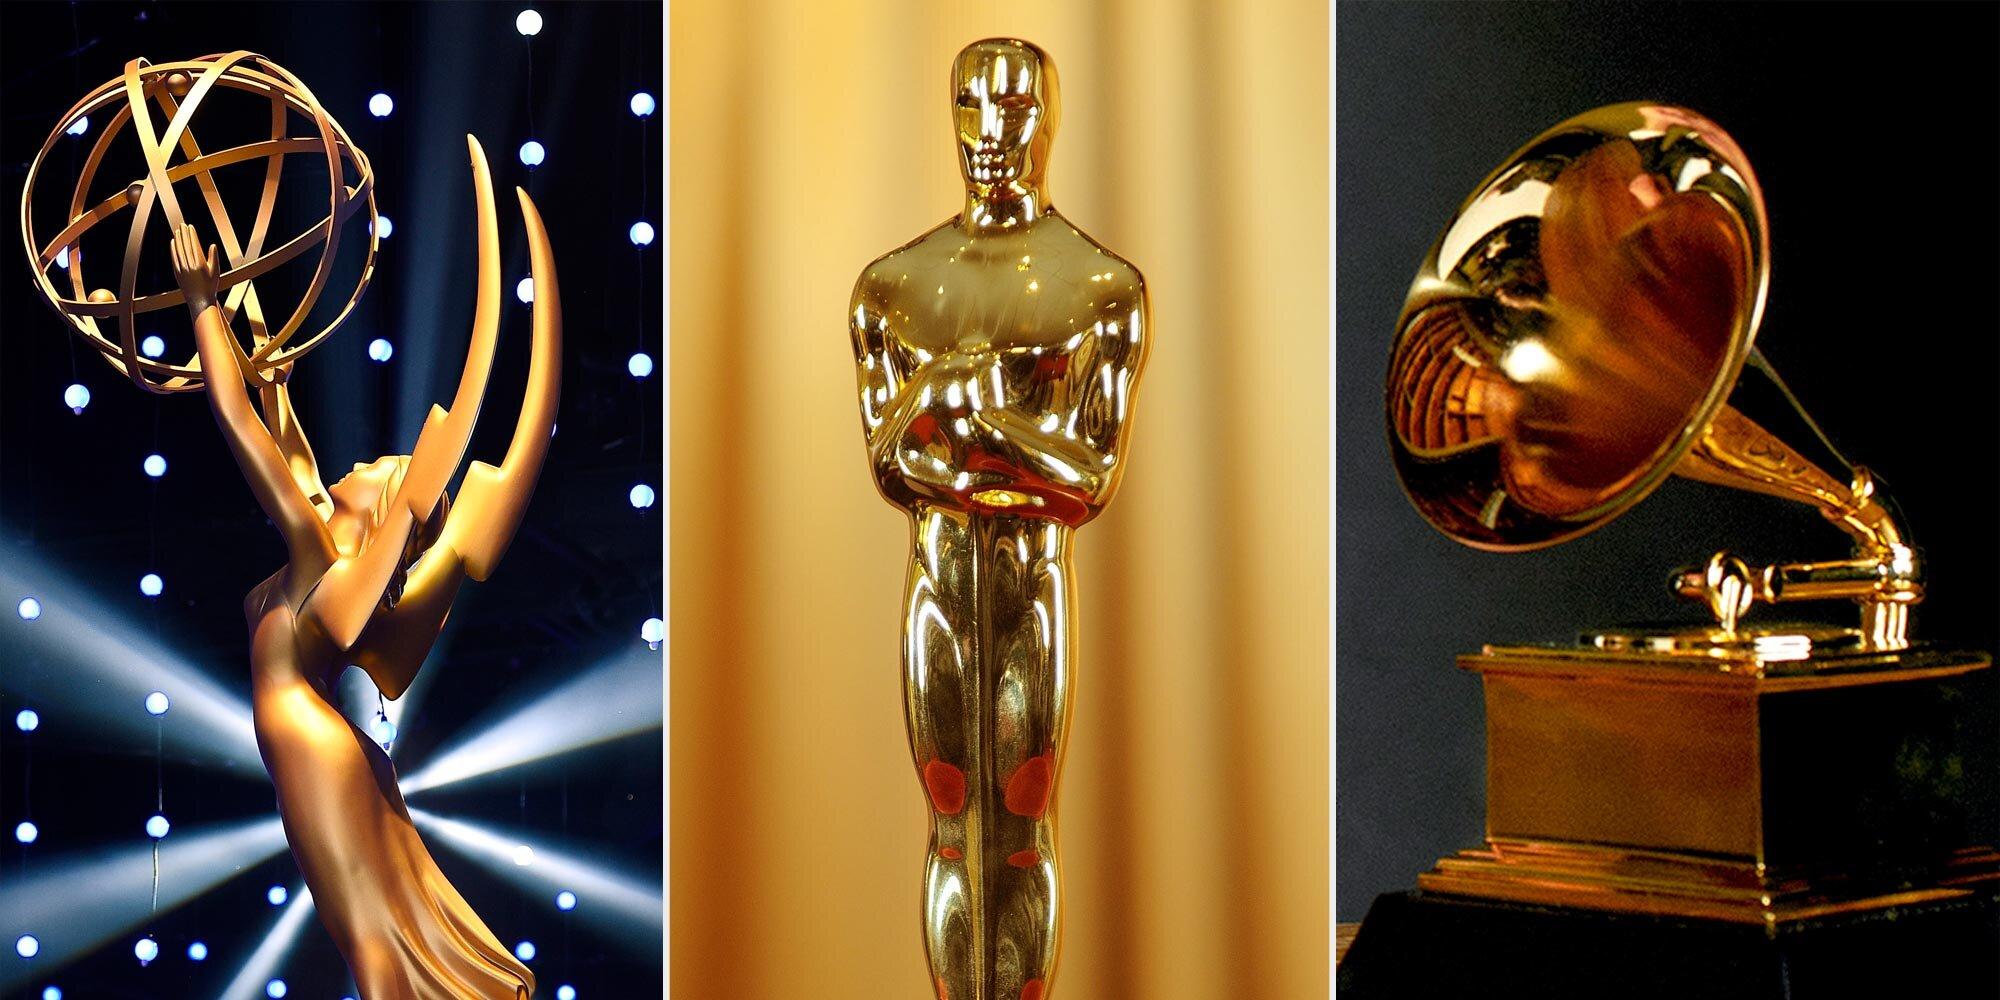 2022 awards season calendar: Oscars, Emmys dates announced, Golden Globes on hiatus